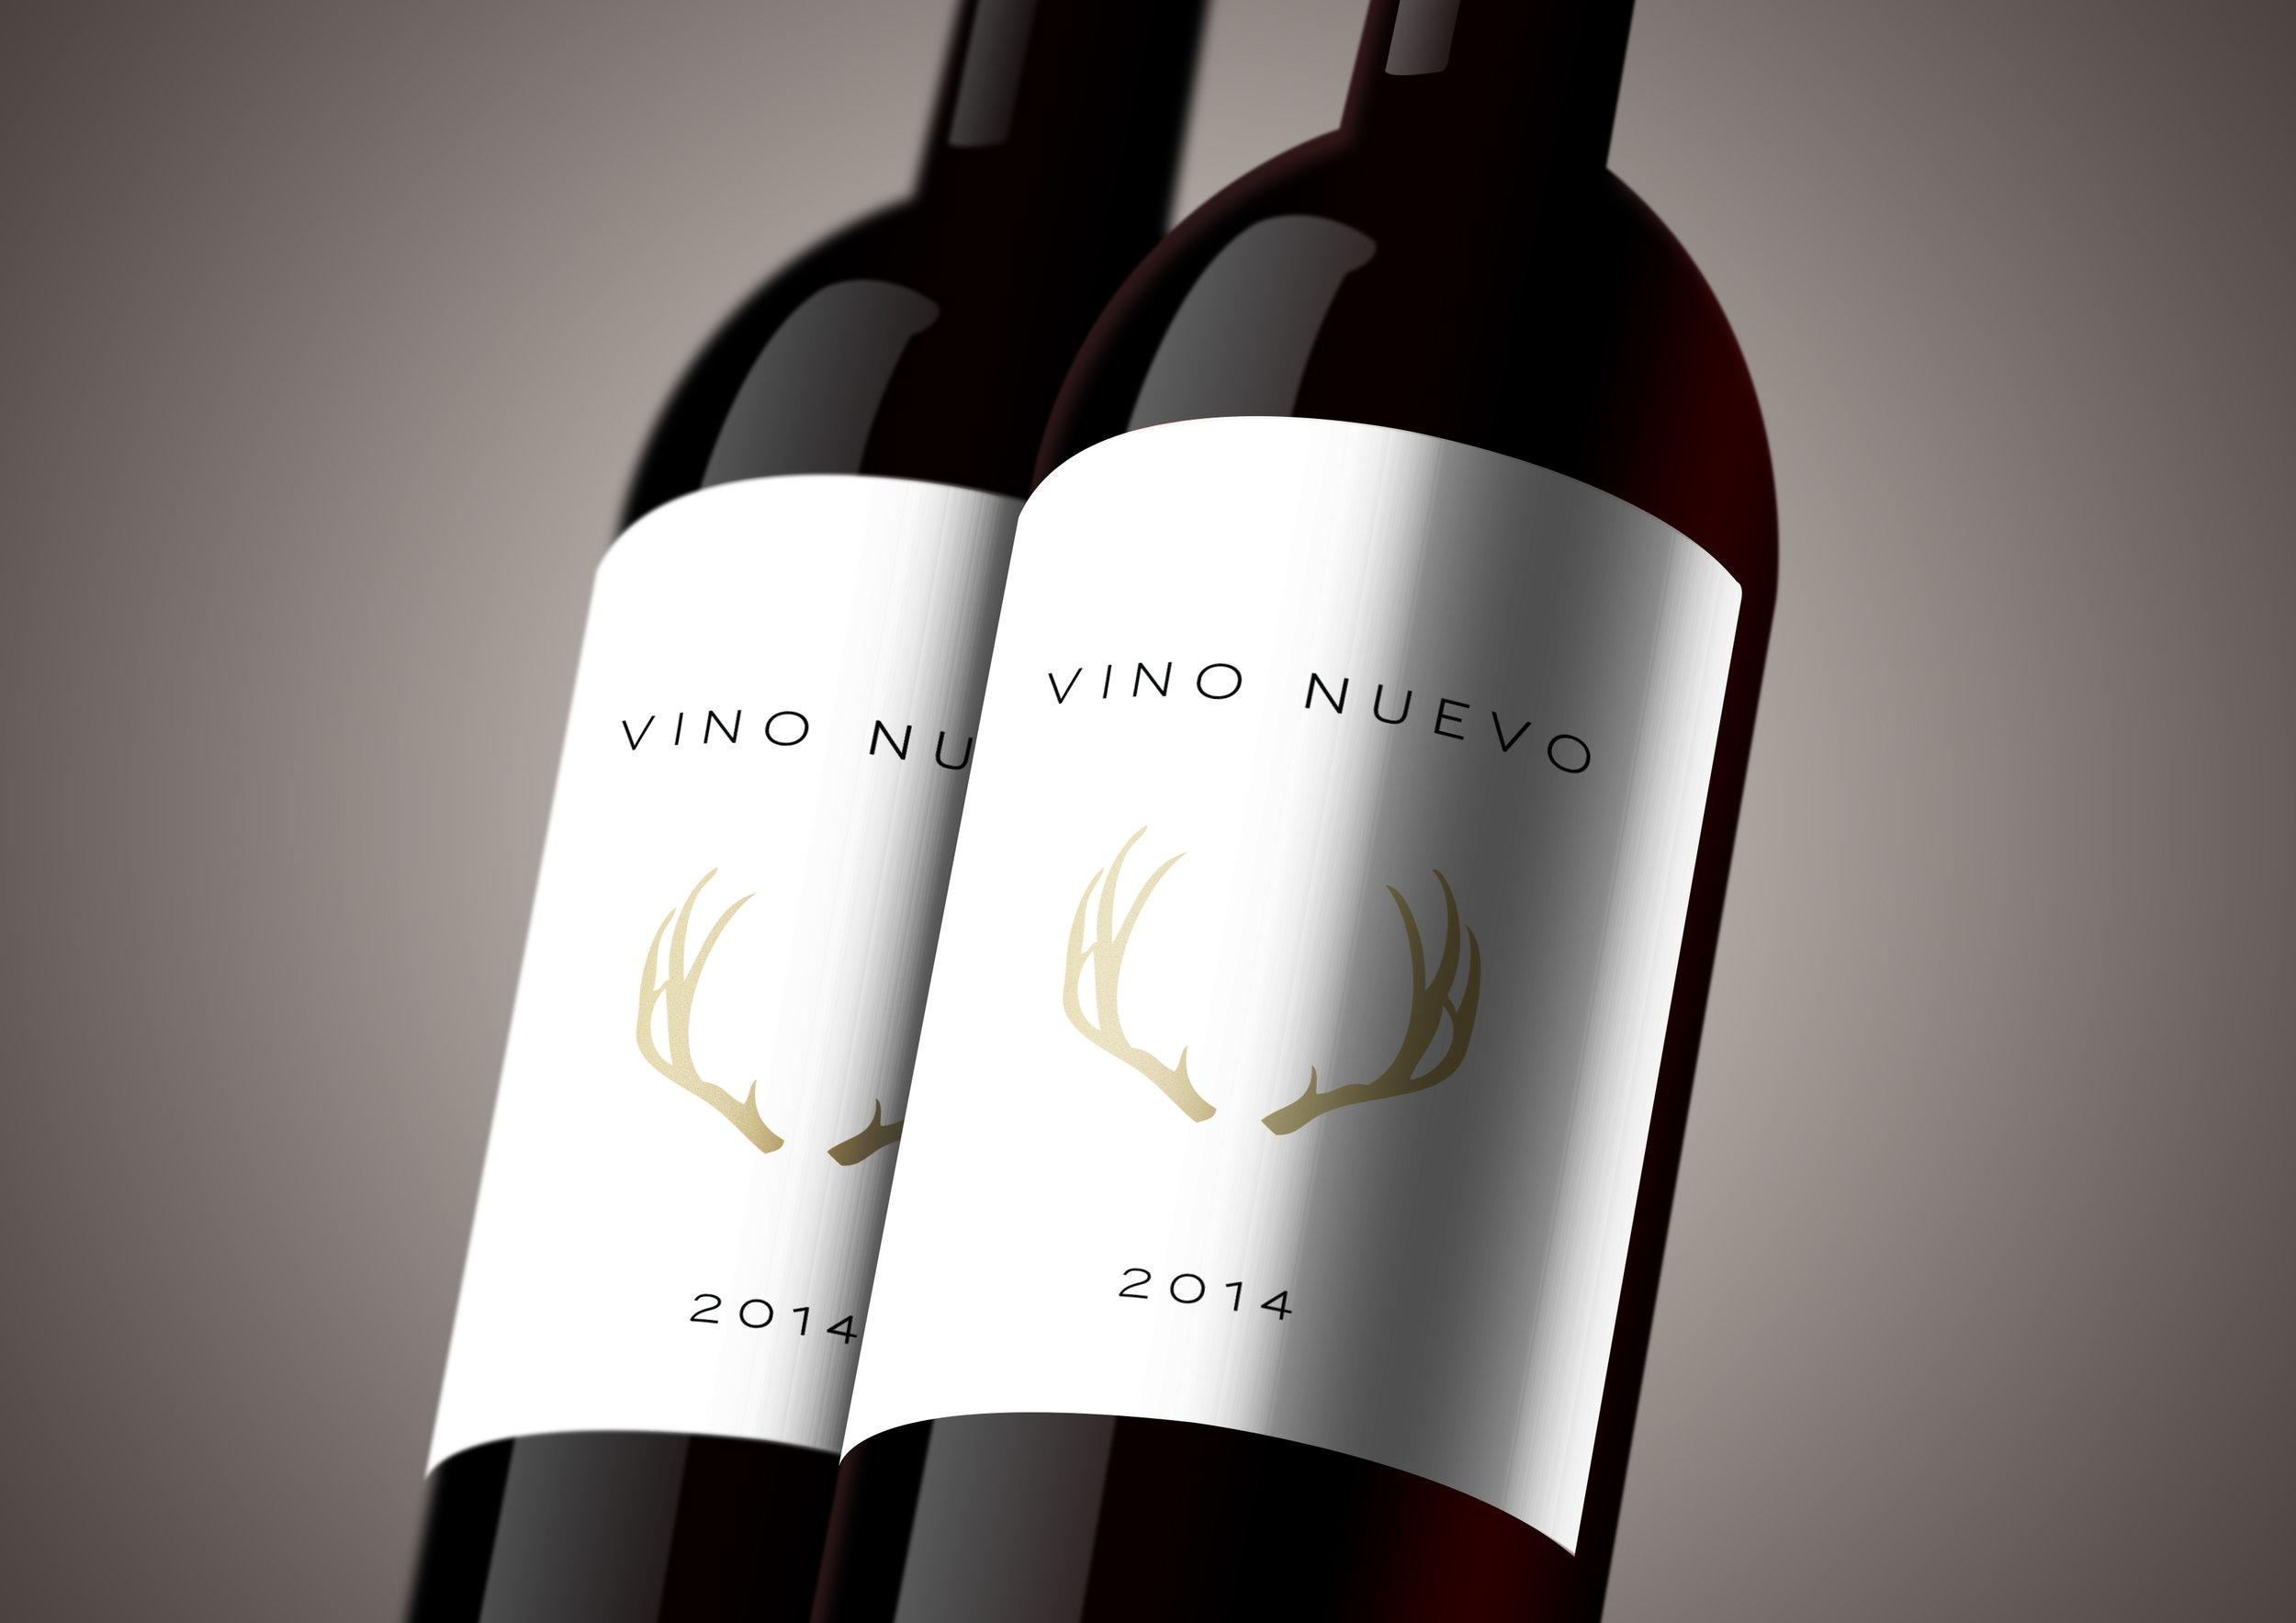 Vino Nuevo 2 bottle shot.jpg